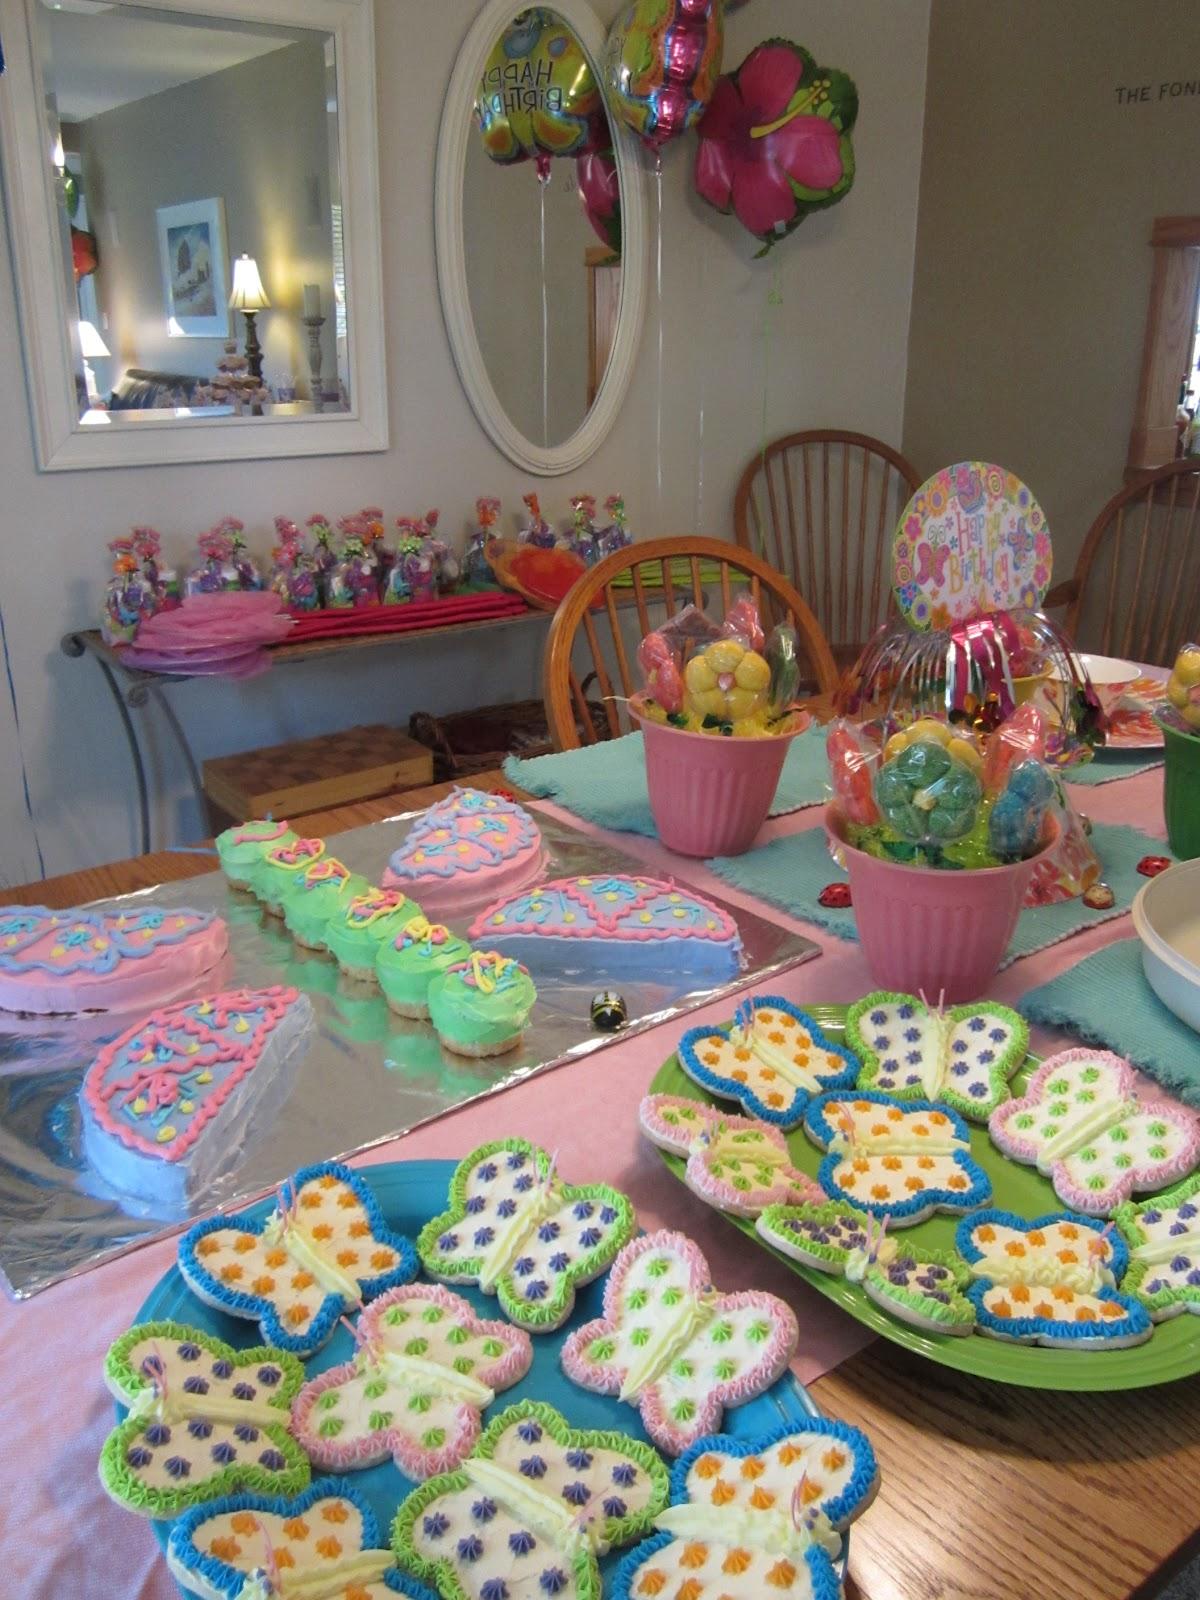 Oh, My Soul Rejoice!: Butterfly & Flower Party